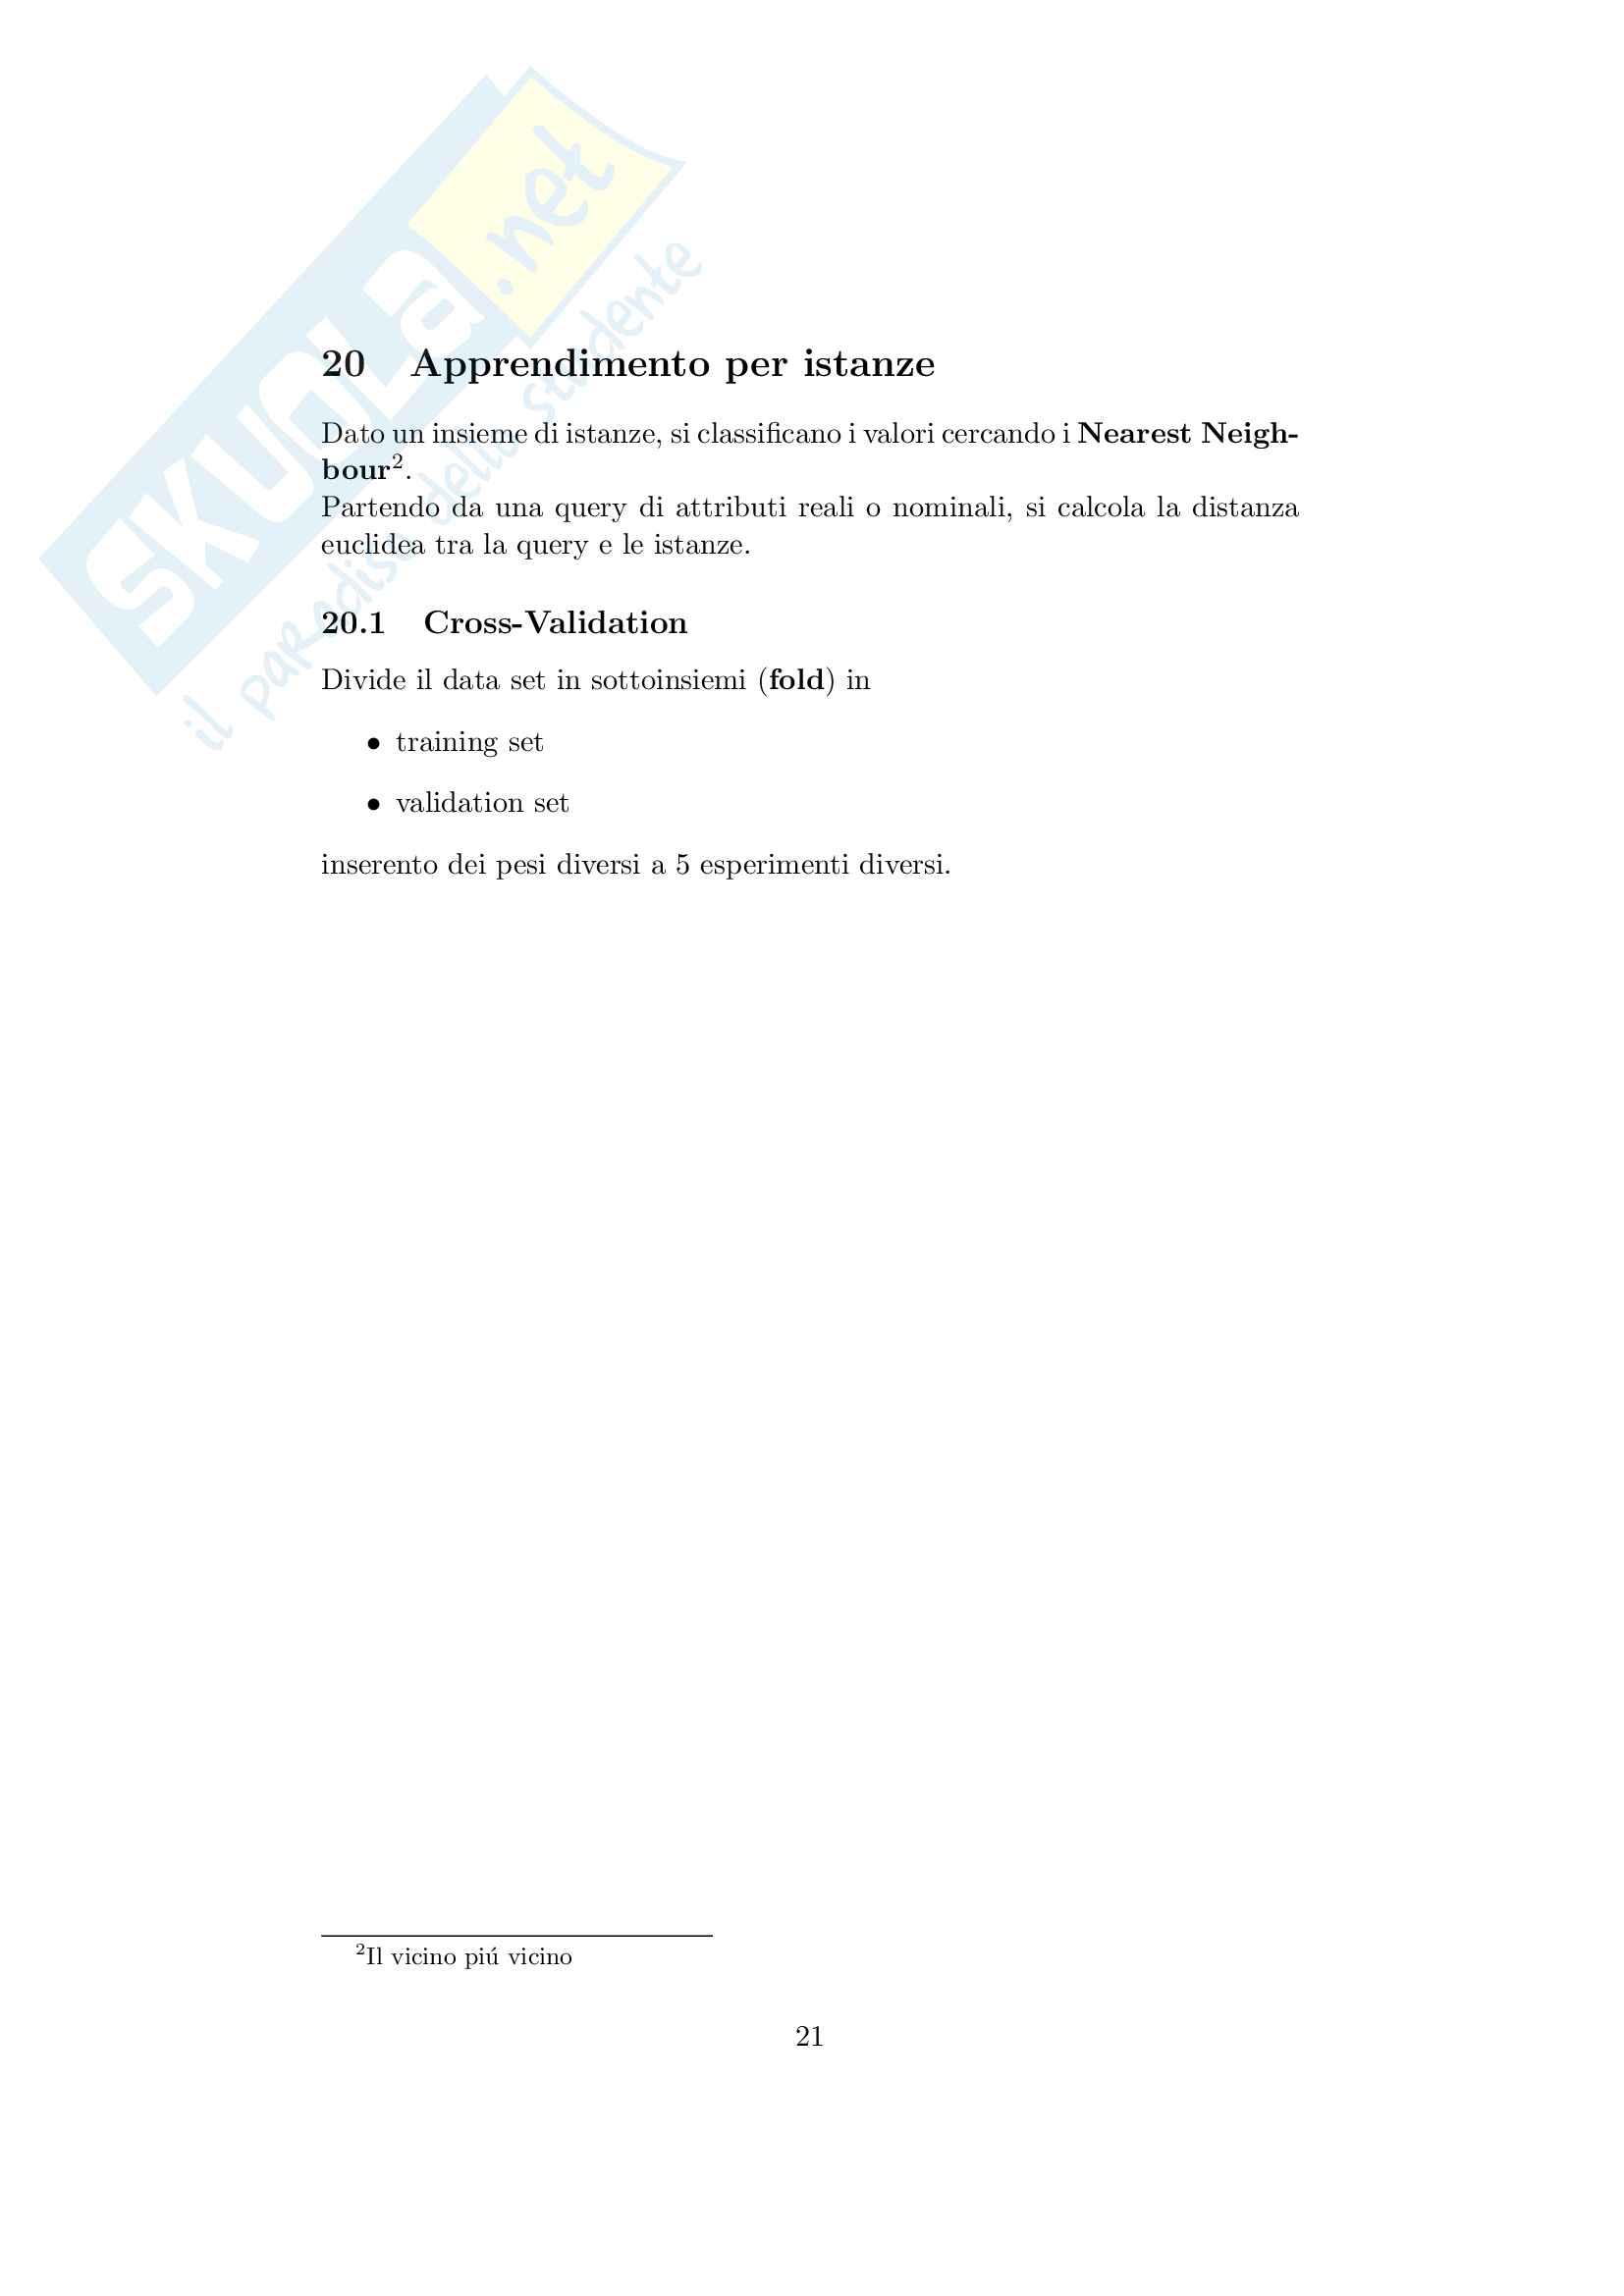 Data mining Pag. 21